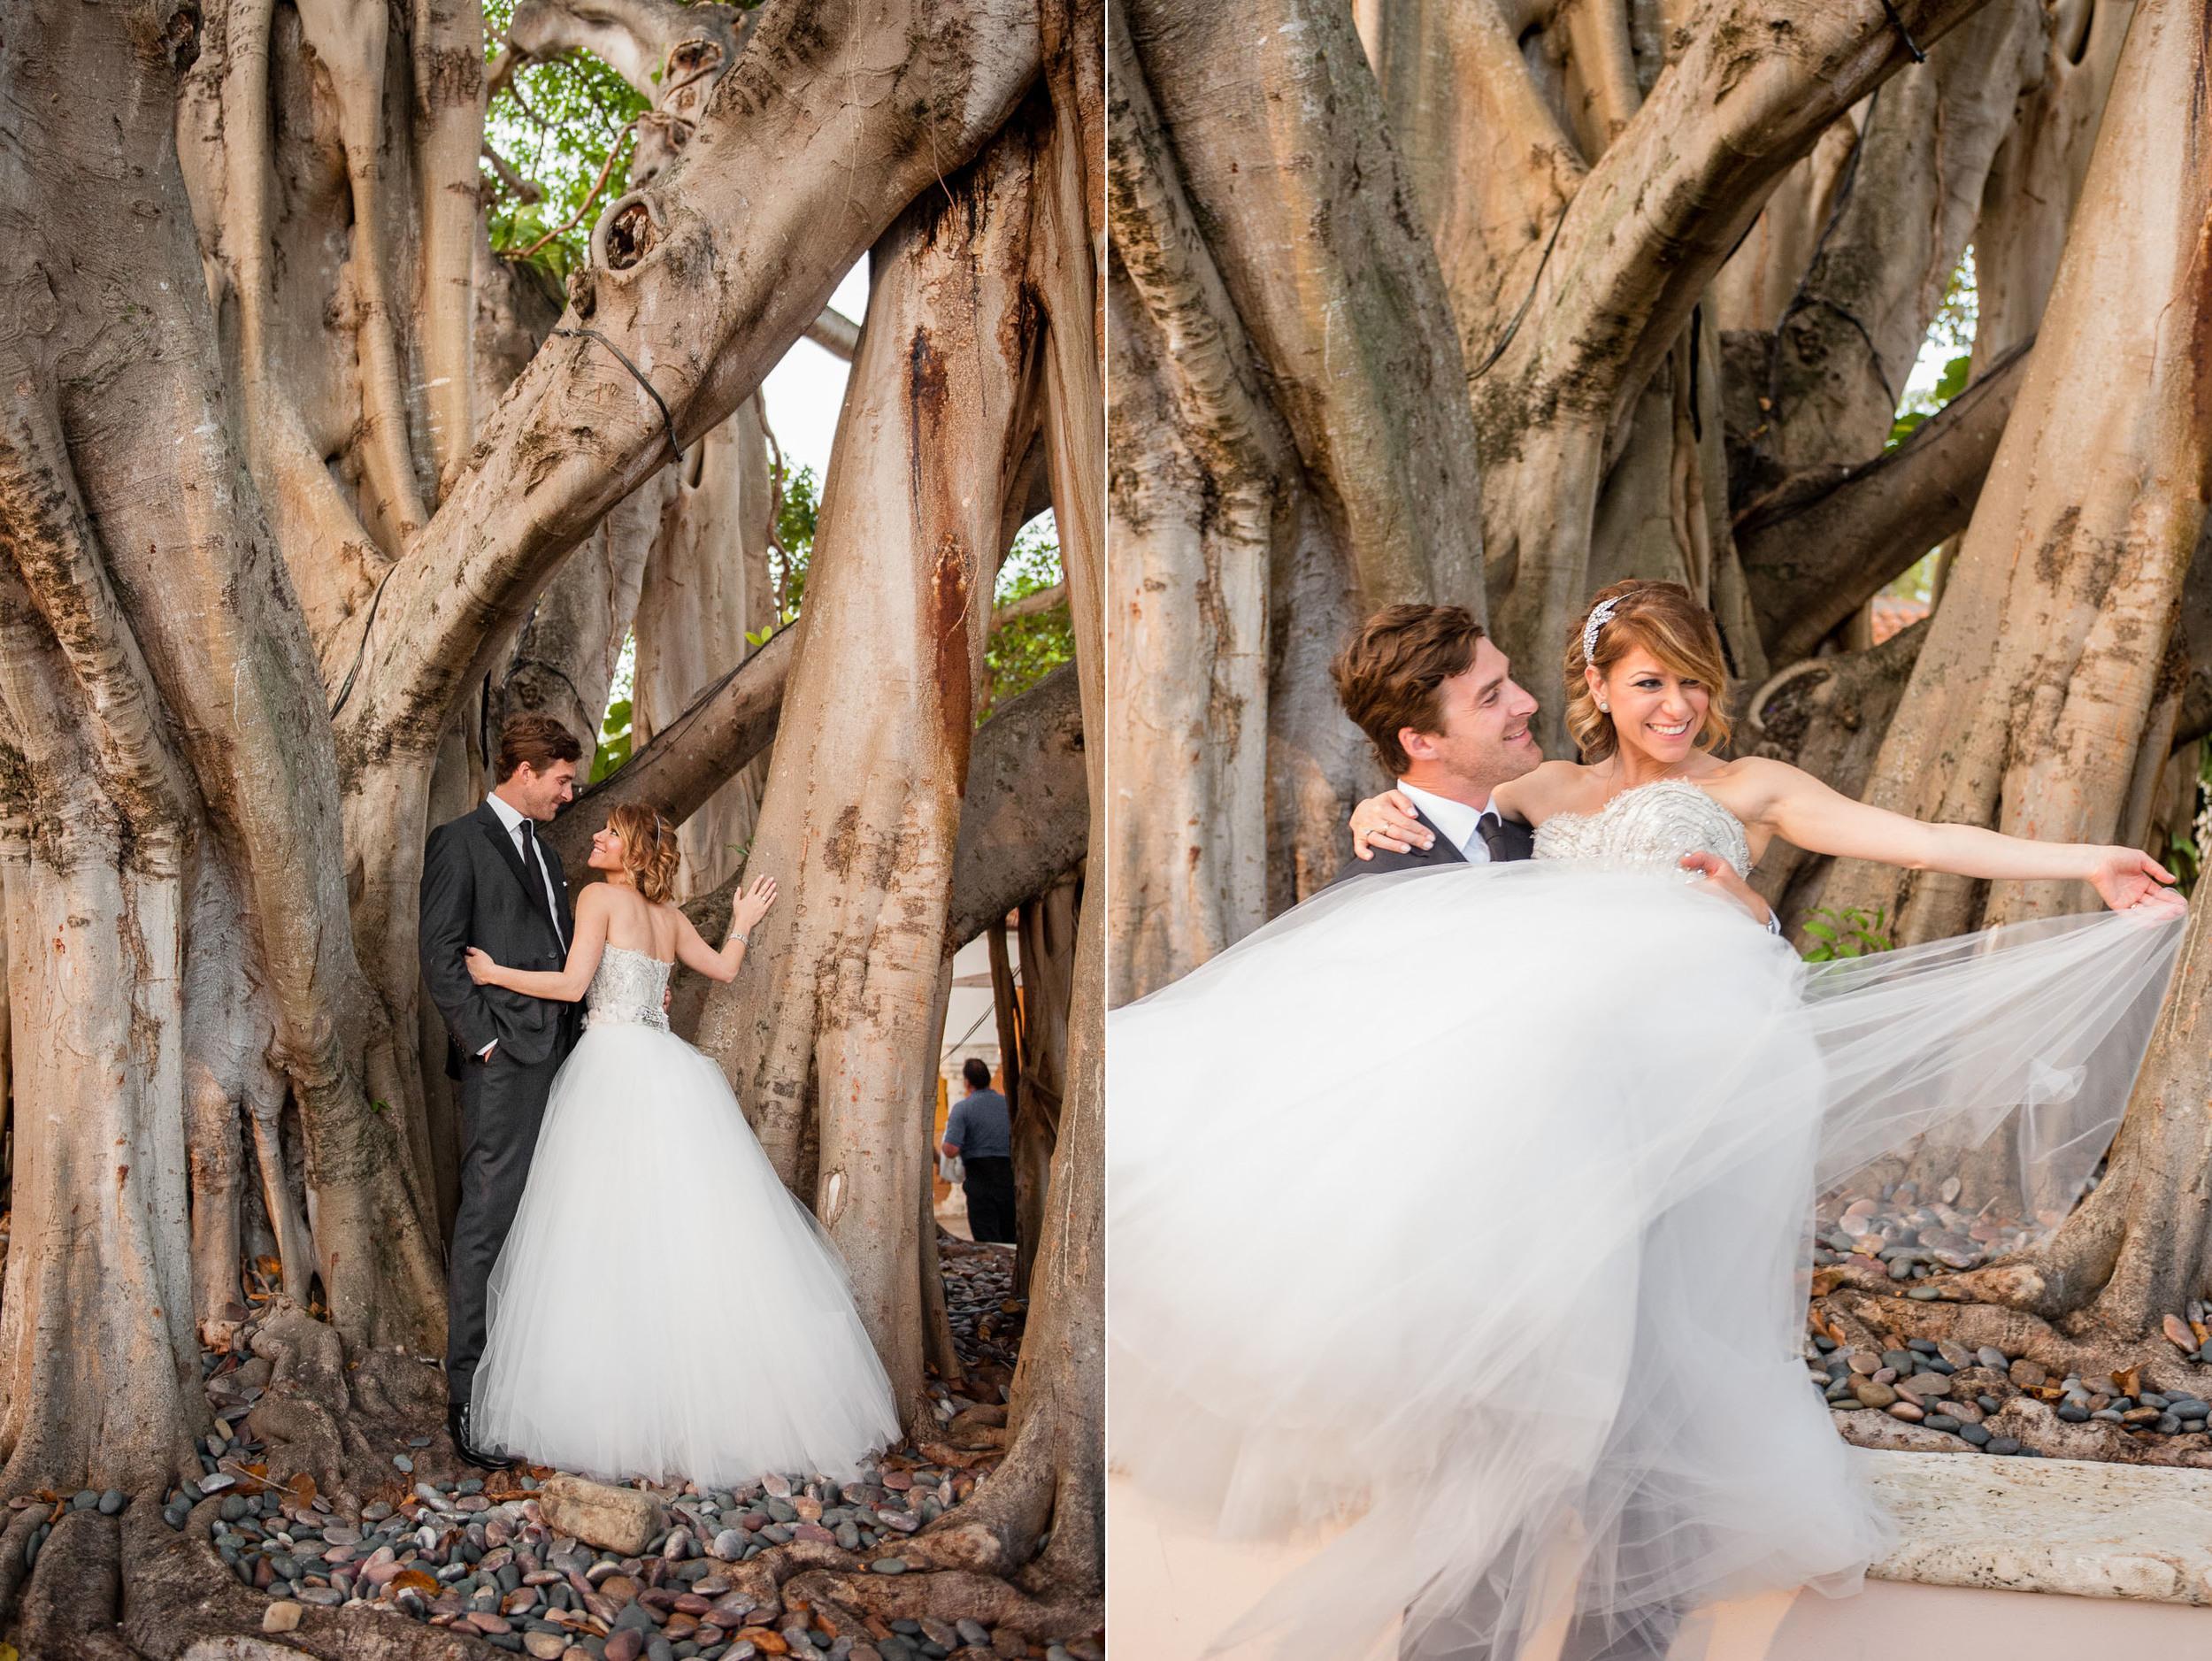 fisher-island-wedding-053.jpg